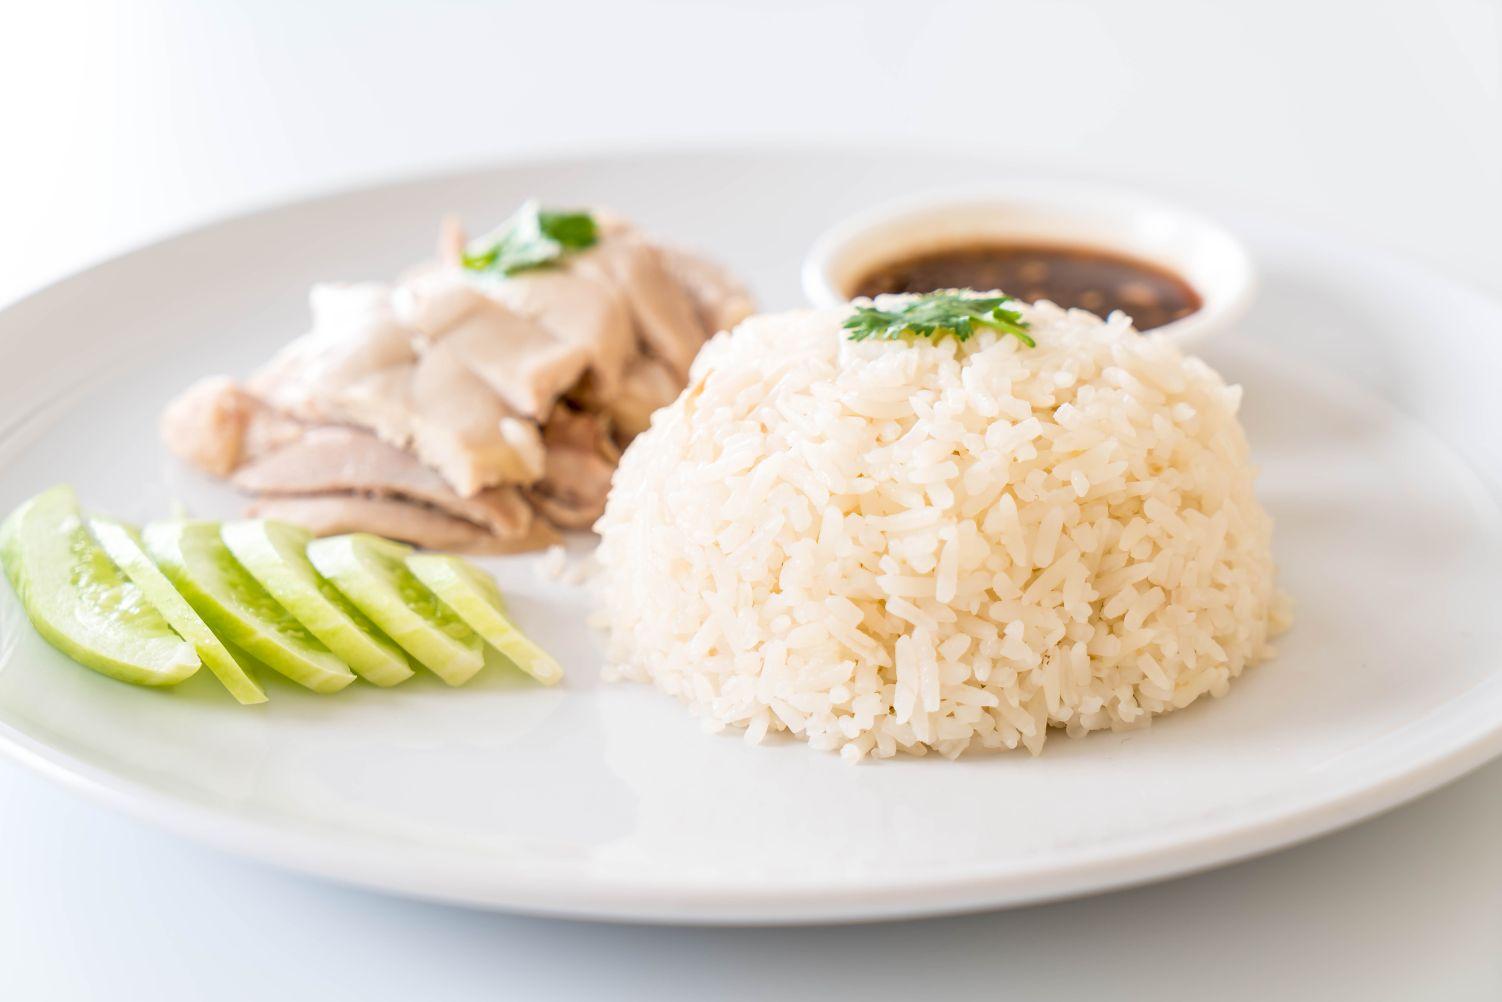 Tane Tane Dökülen Pirinç Pilavı Tarifi